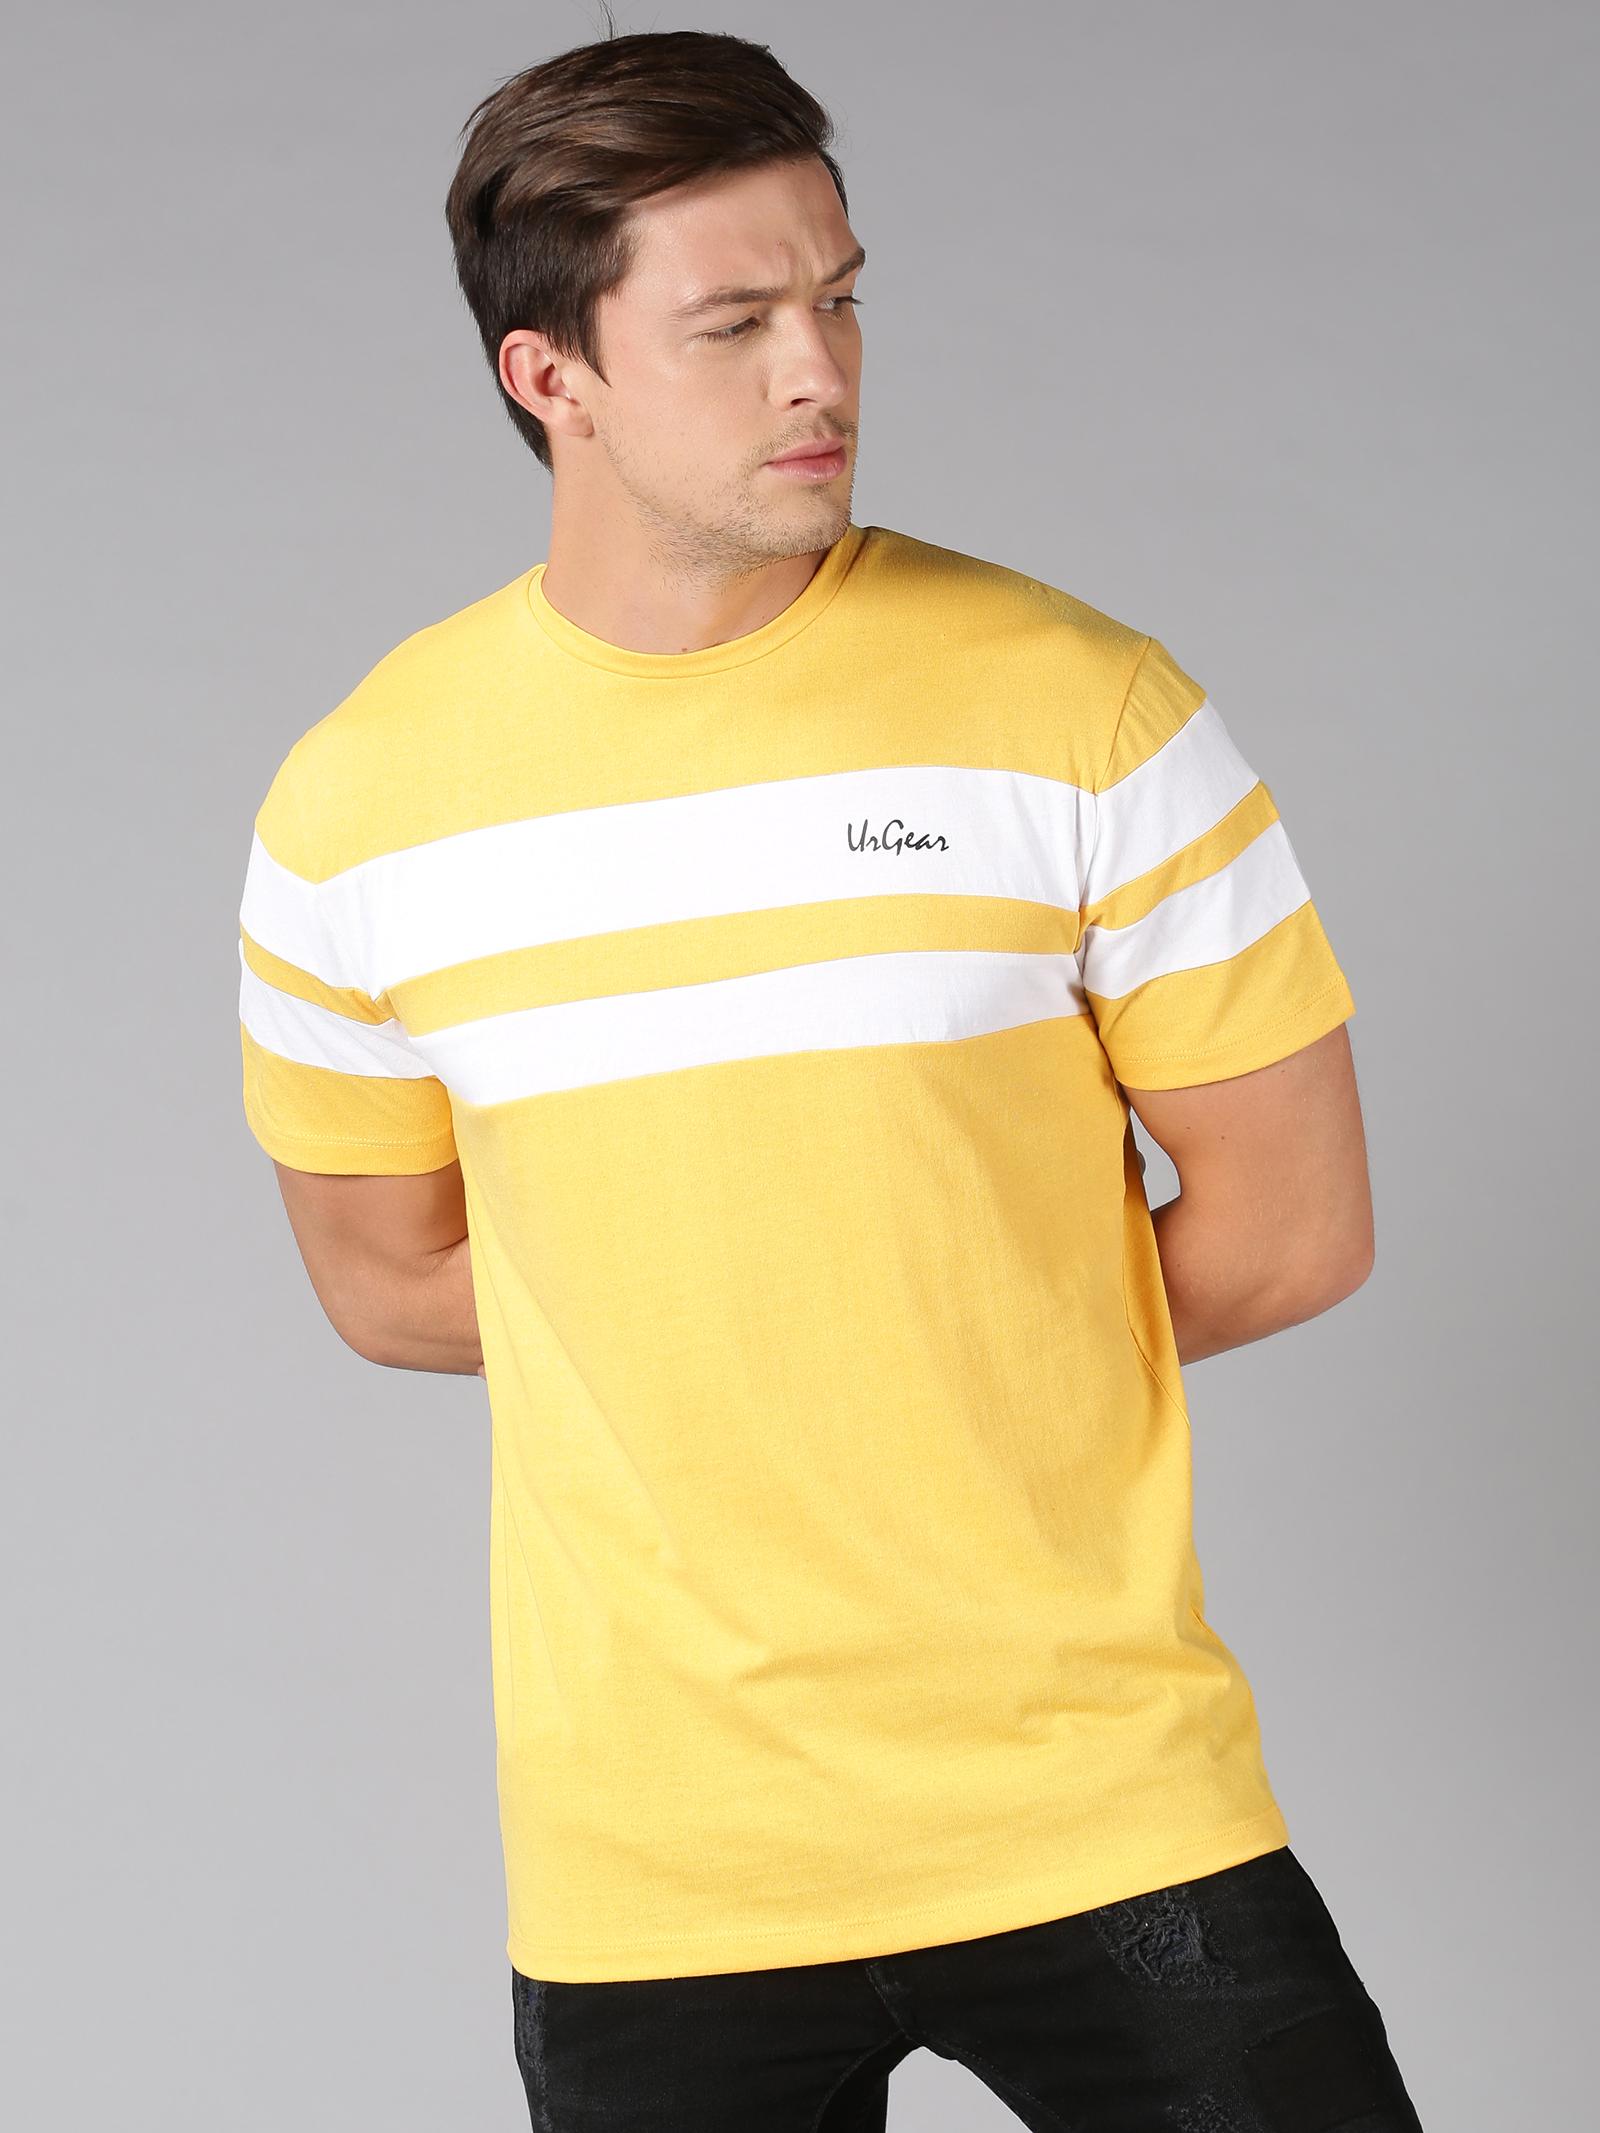 UrGear | UrGear Striped Men Round Neck Yellow T-Shirt